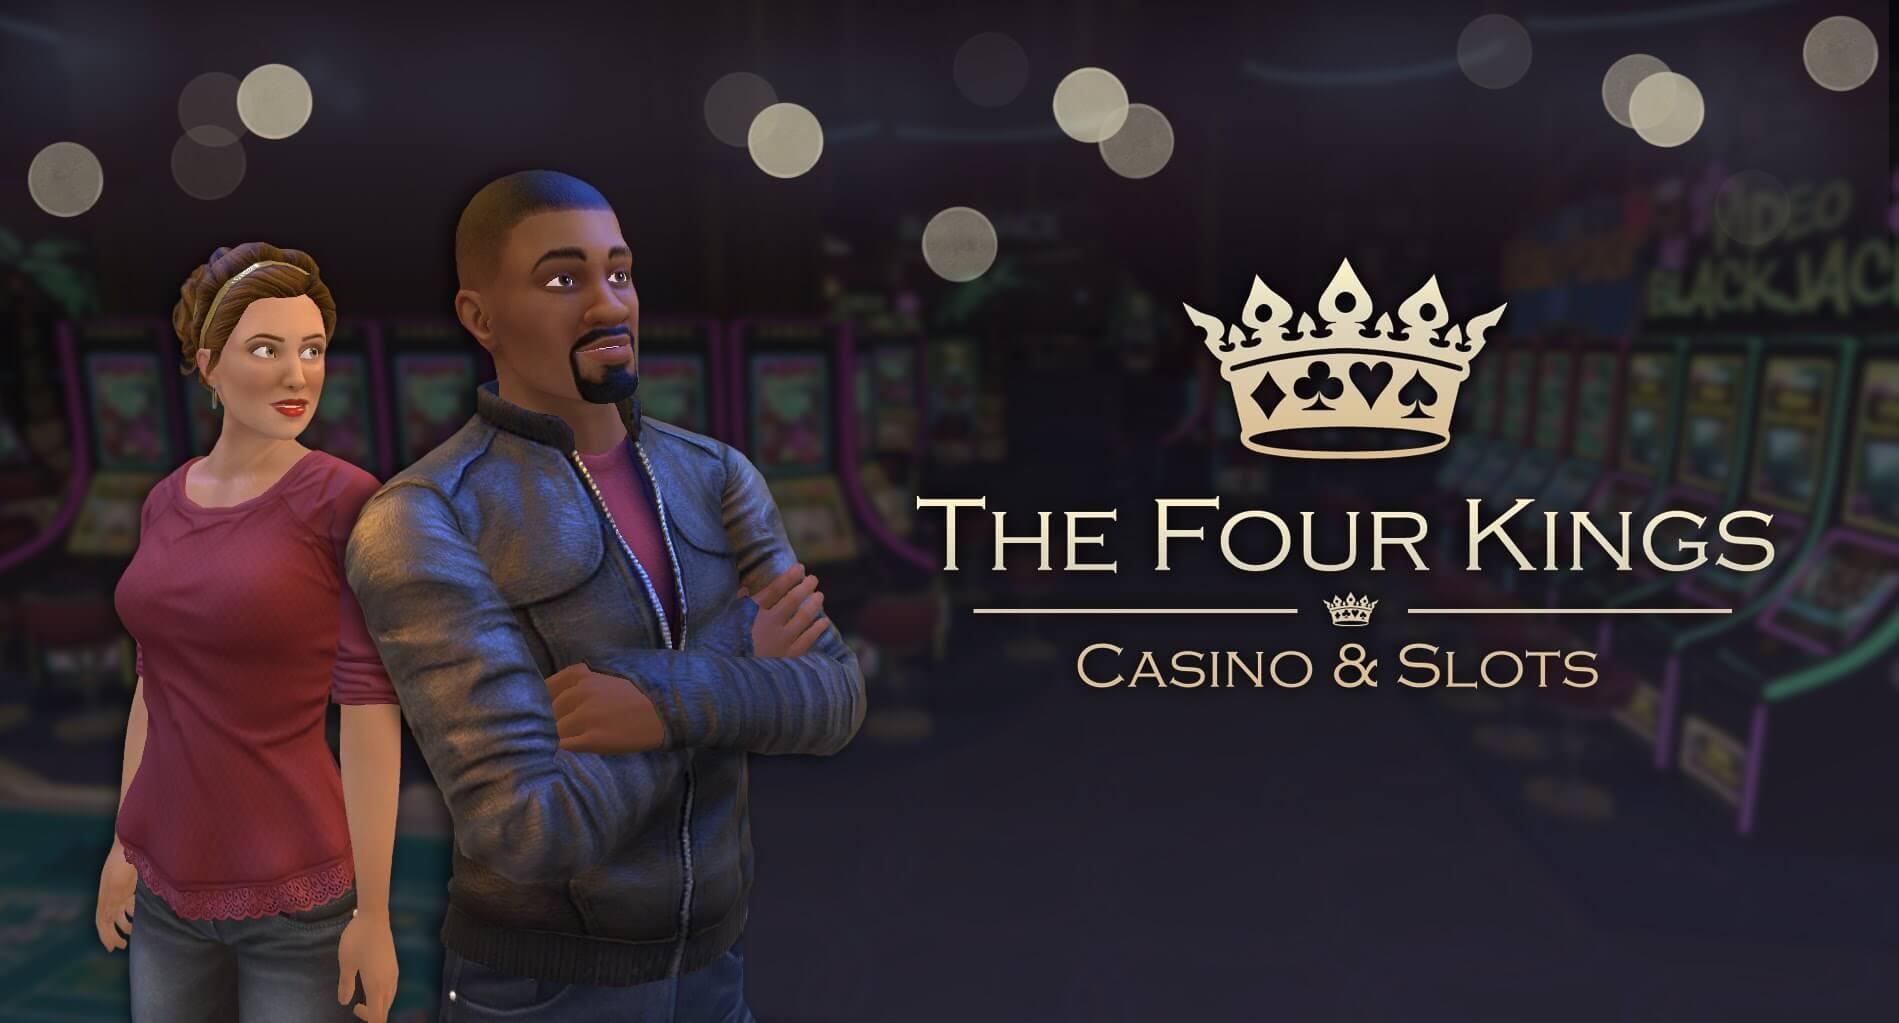 play casino slot games no download